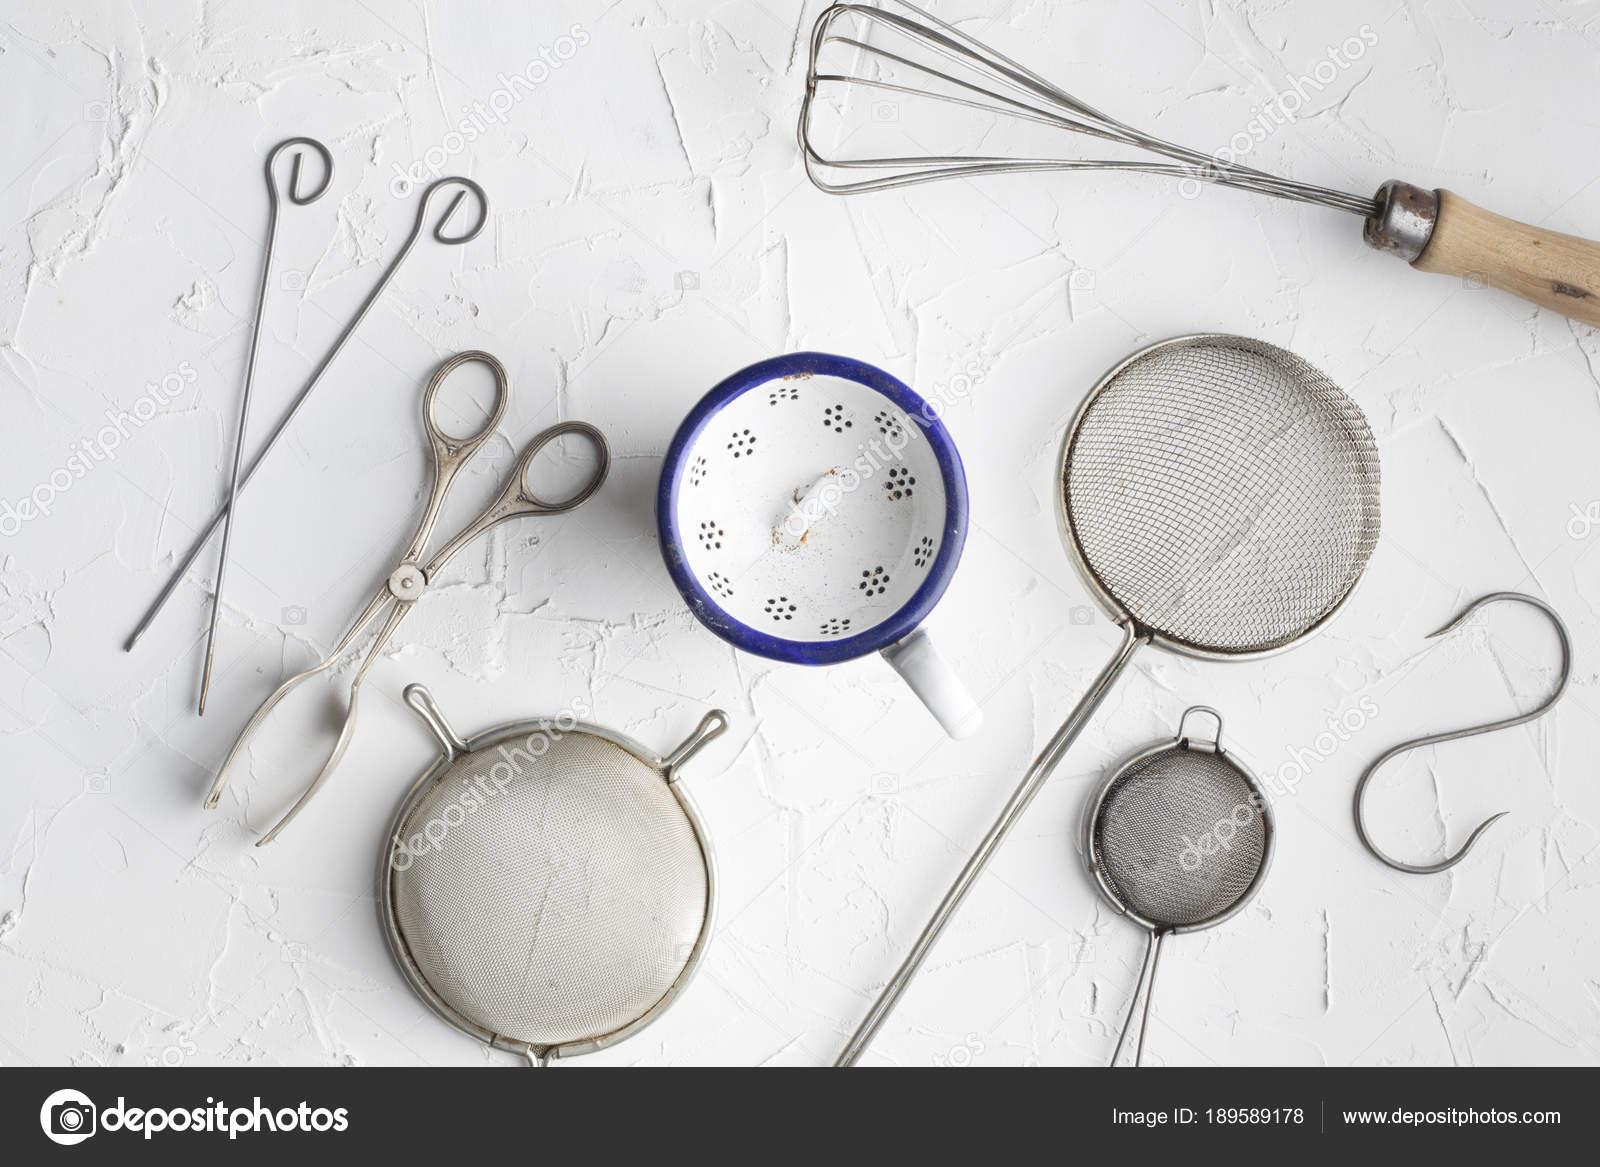 Vintage Kitchen Utensils Background Fork Kifes Spoons U2014 Stock Photo